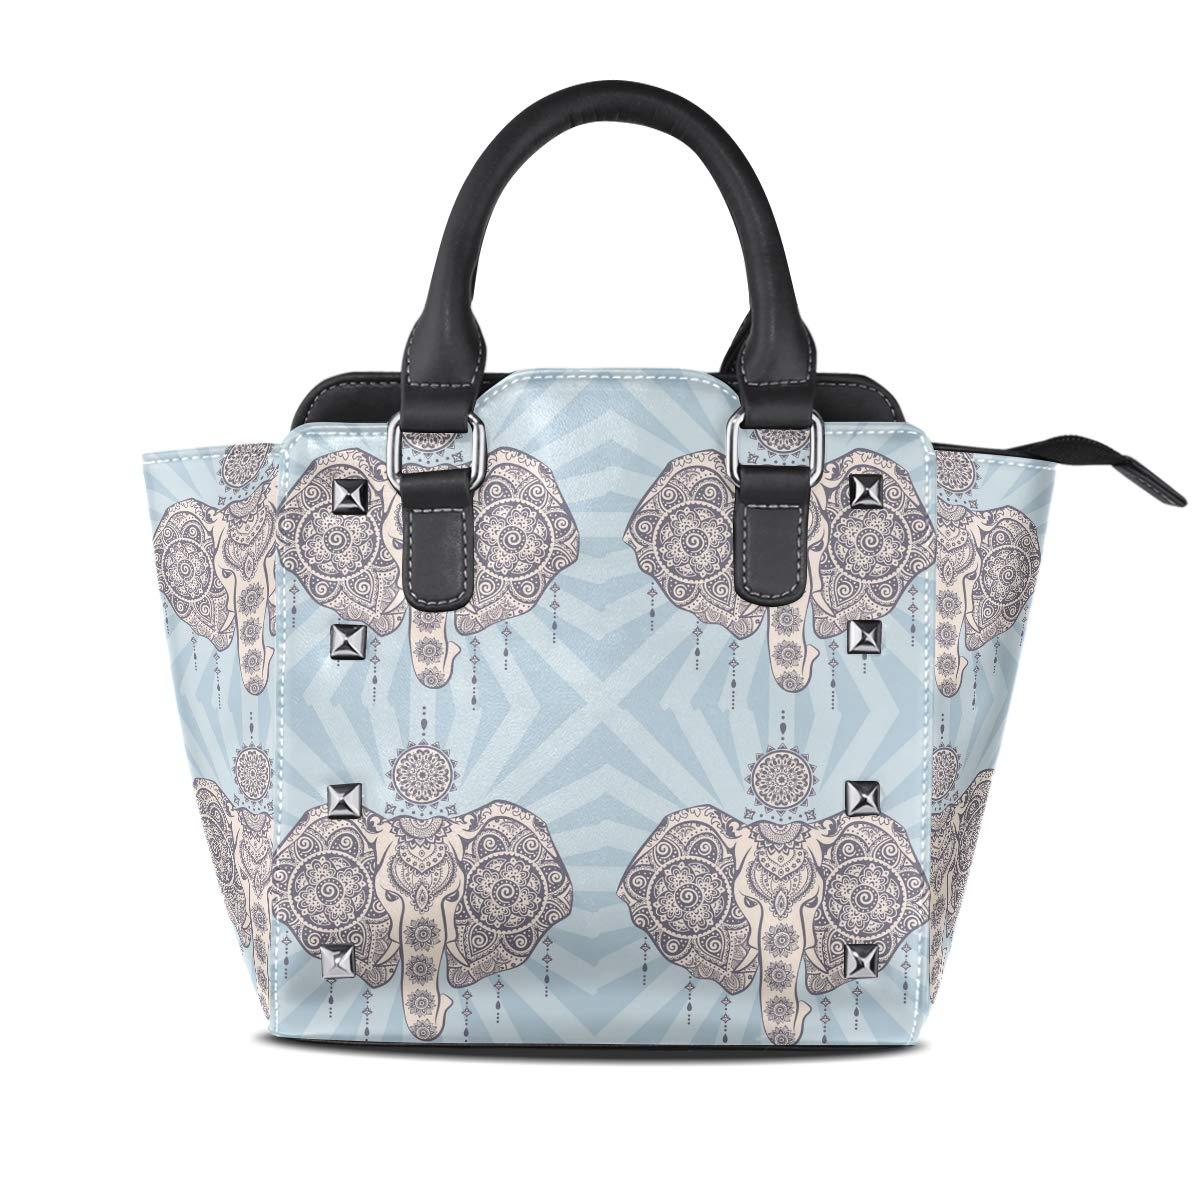 Design1 Handbag Dream Catcher And Ethnic Style Elephant Totem Genuine Leather Tote Rivet Bag Shoulder Strap Top Handle Women